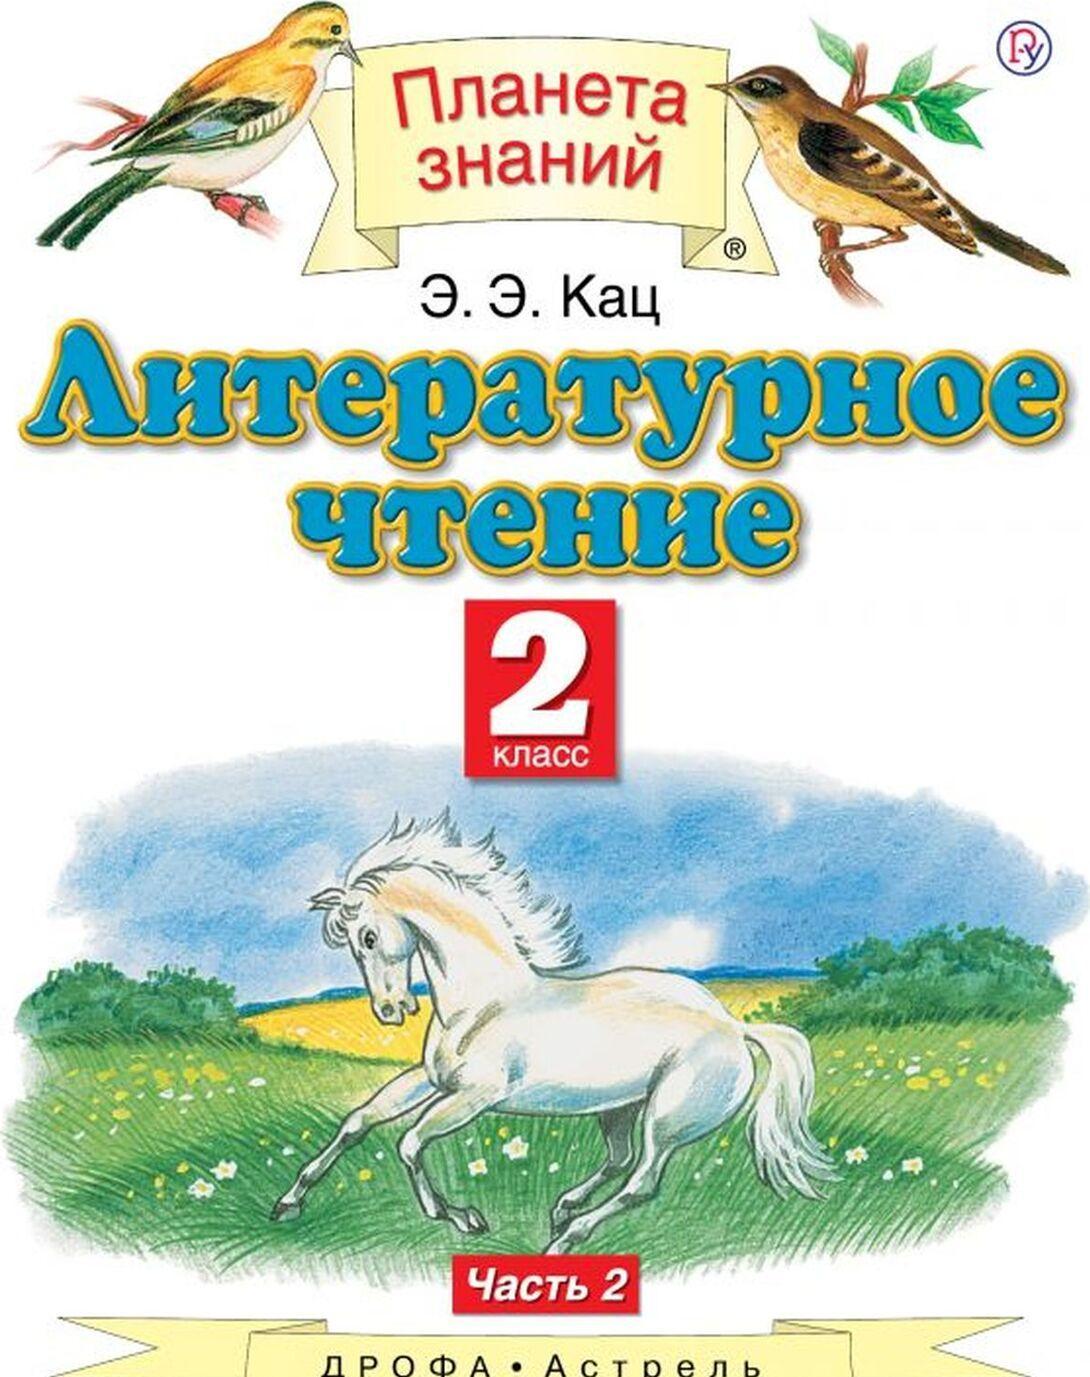 Literaturnoe chtenie. 2 klass. V 2-kh chastjakh. Chast 2